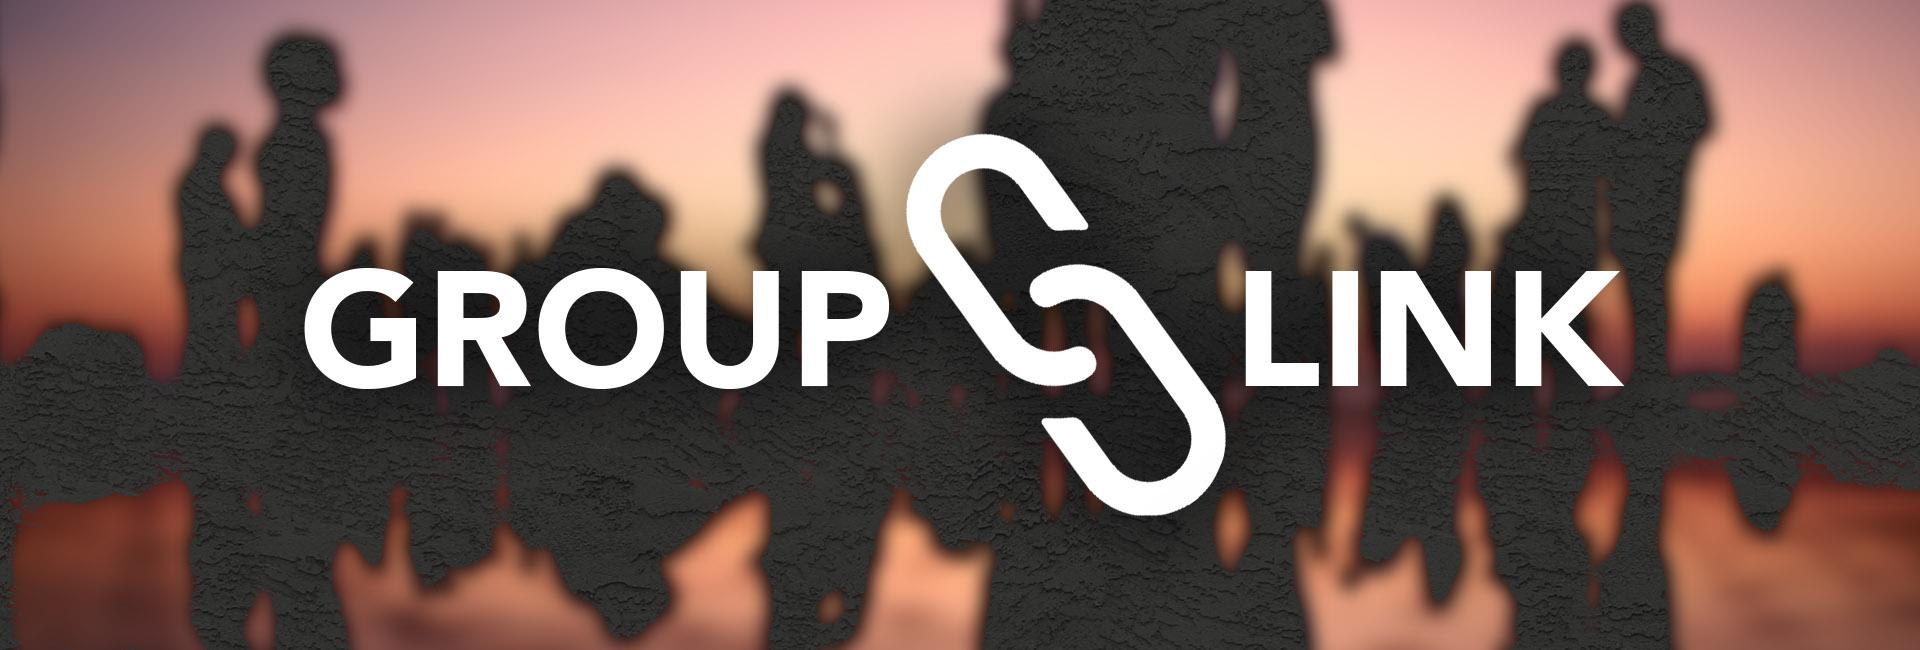 Group Link Web